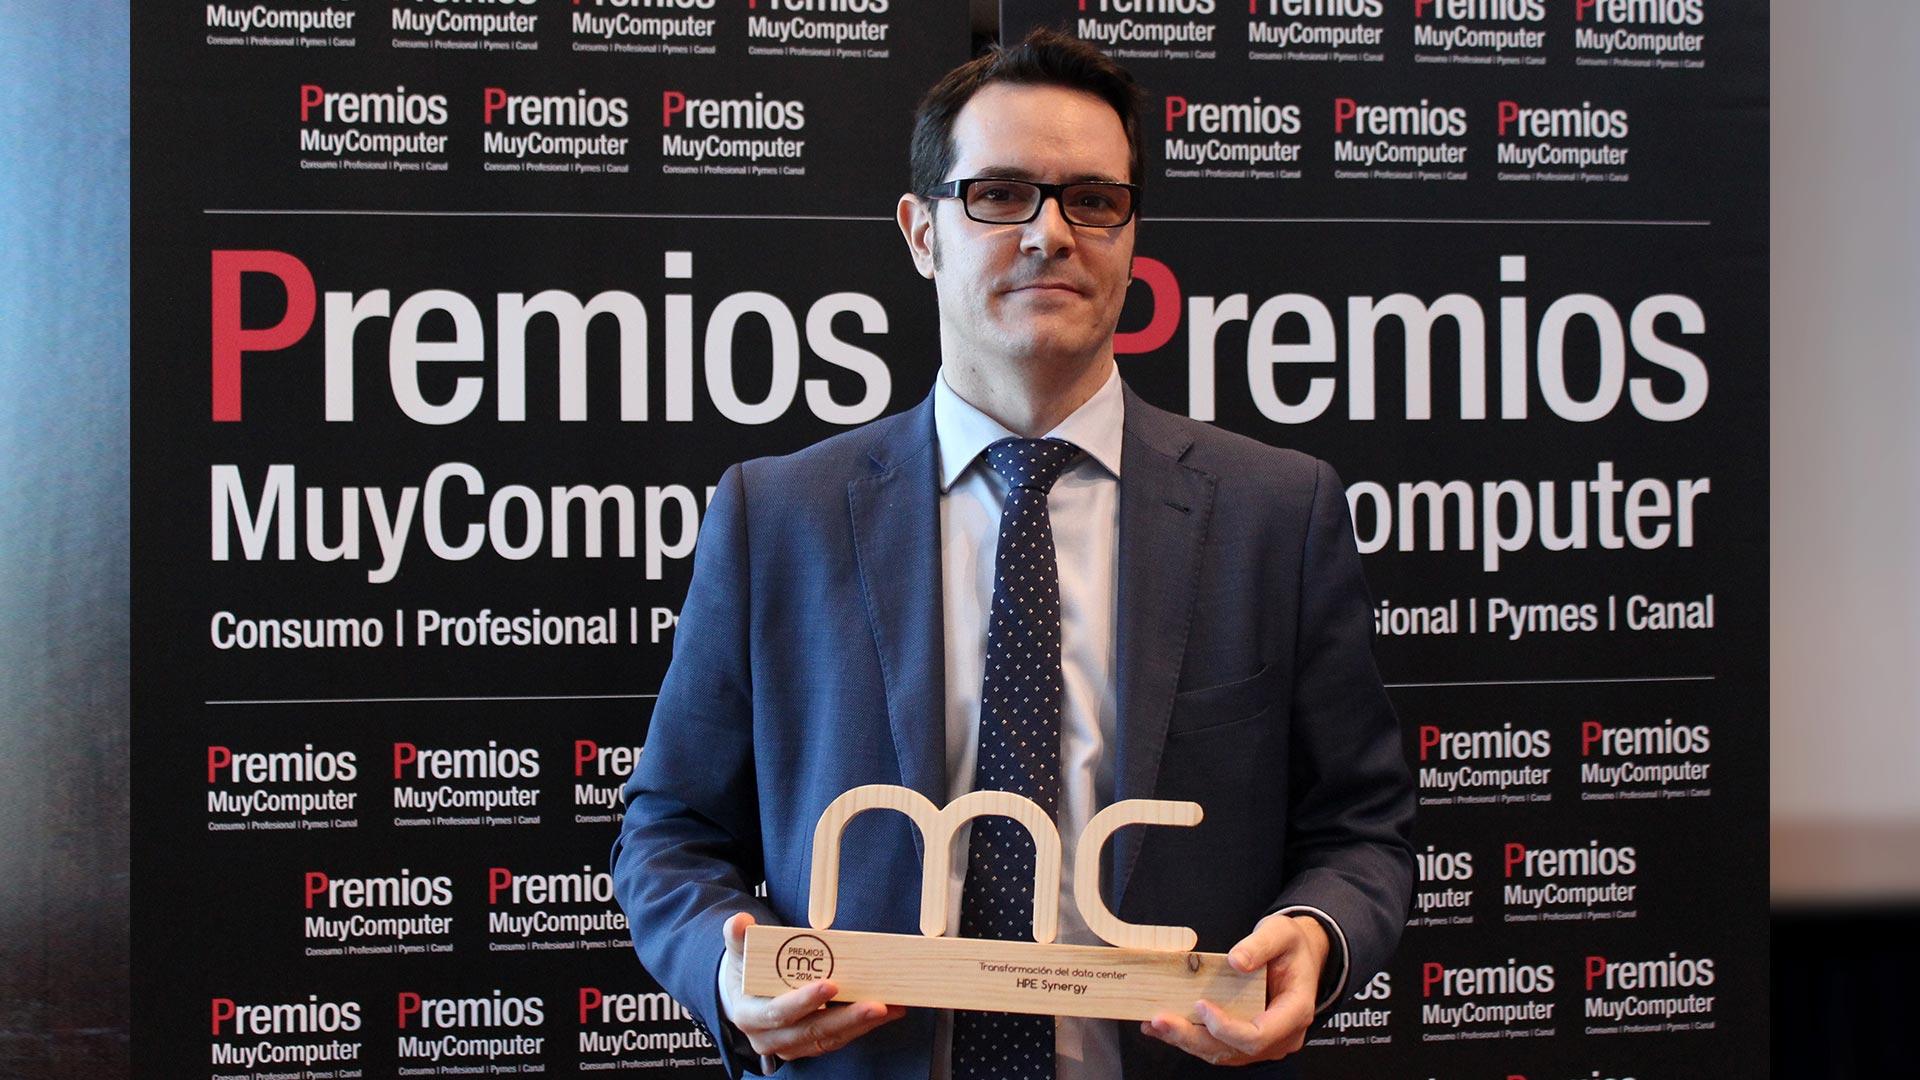 premiosmc2016-transformacion-data-center-hpe-synergy